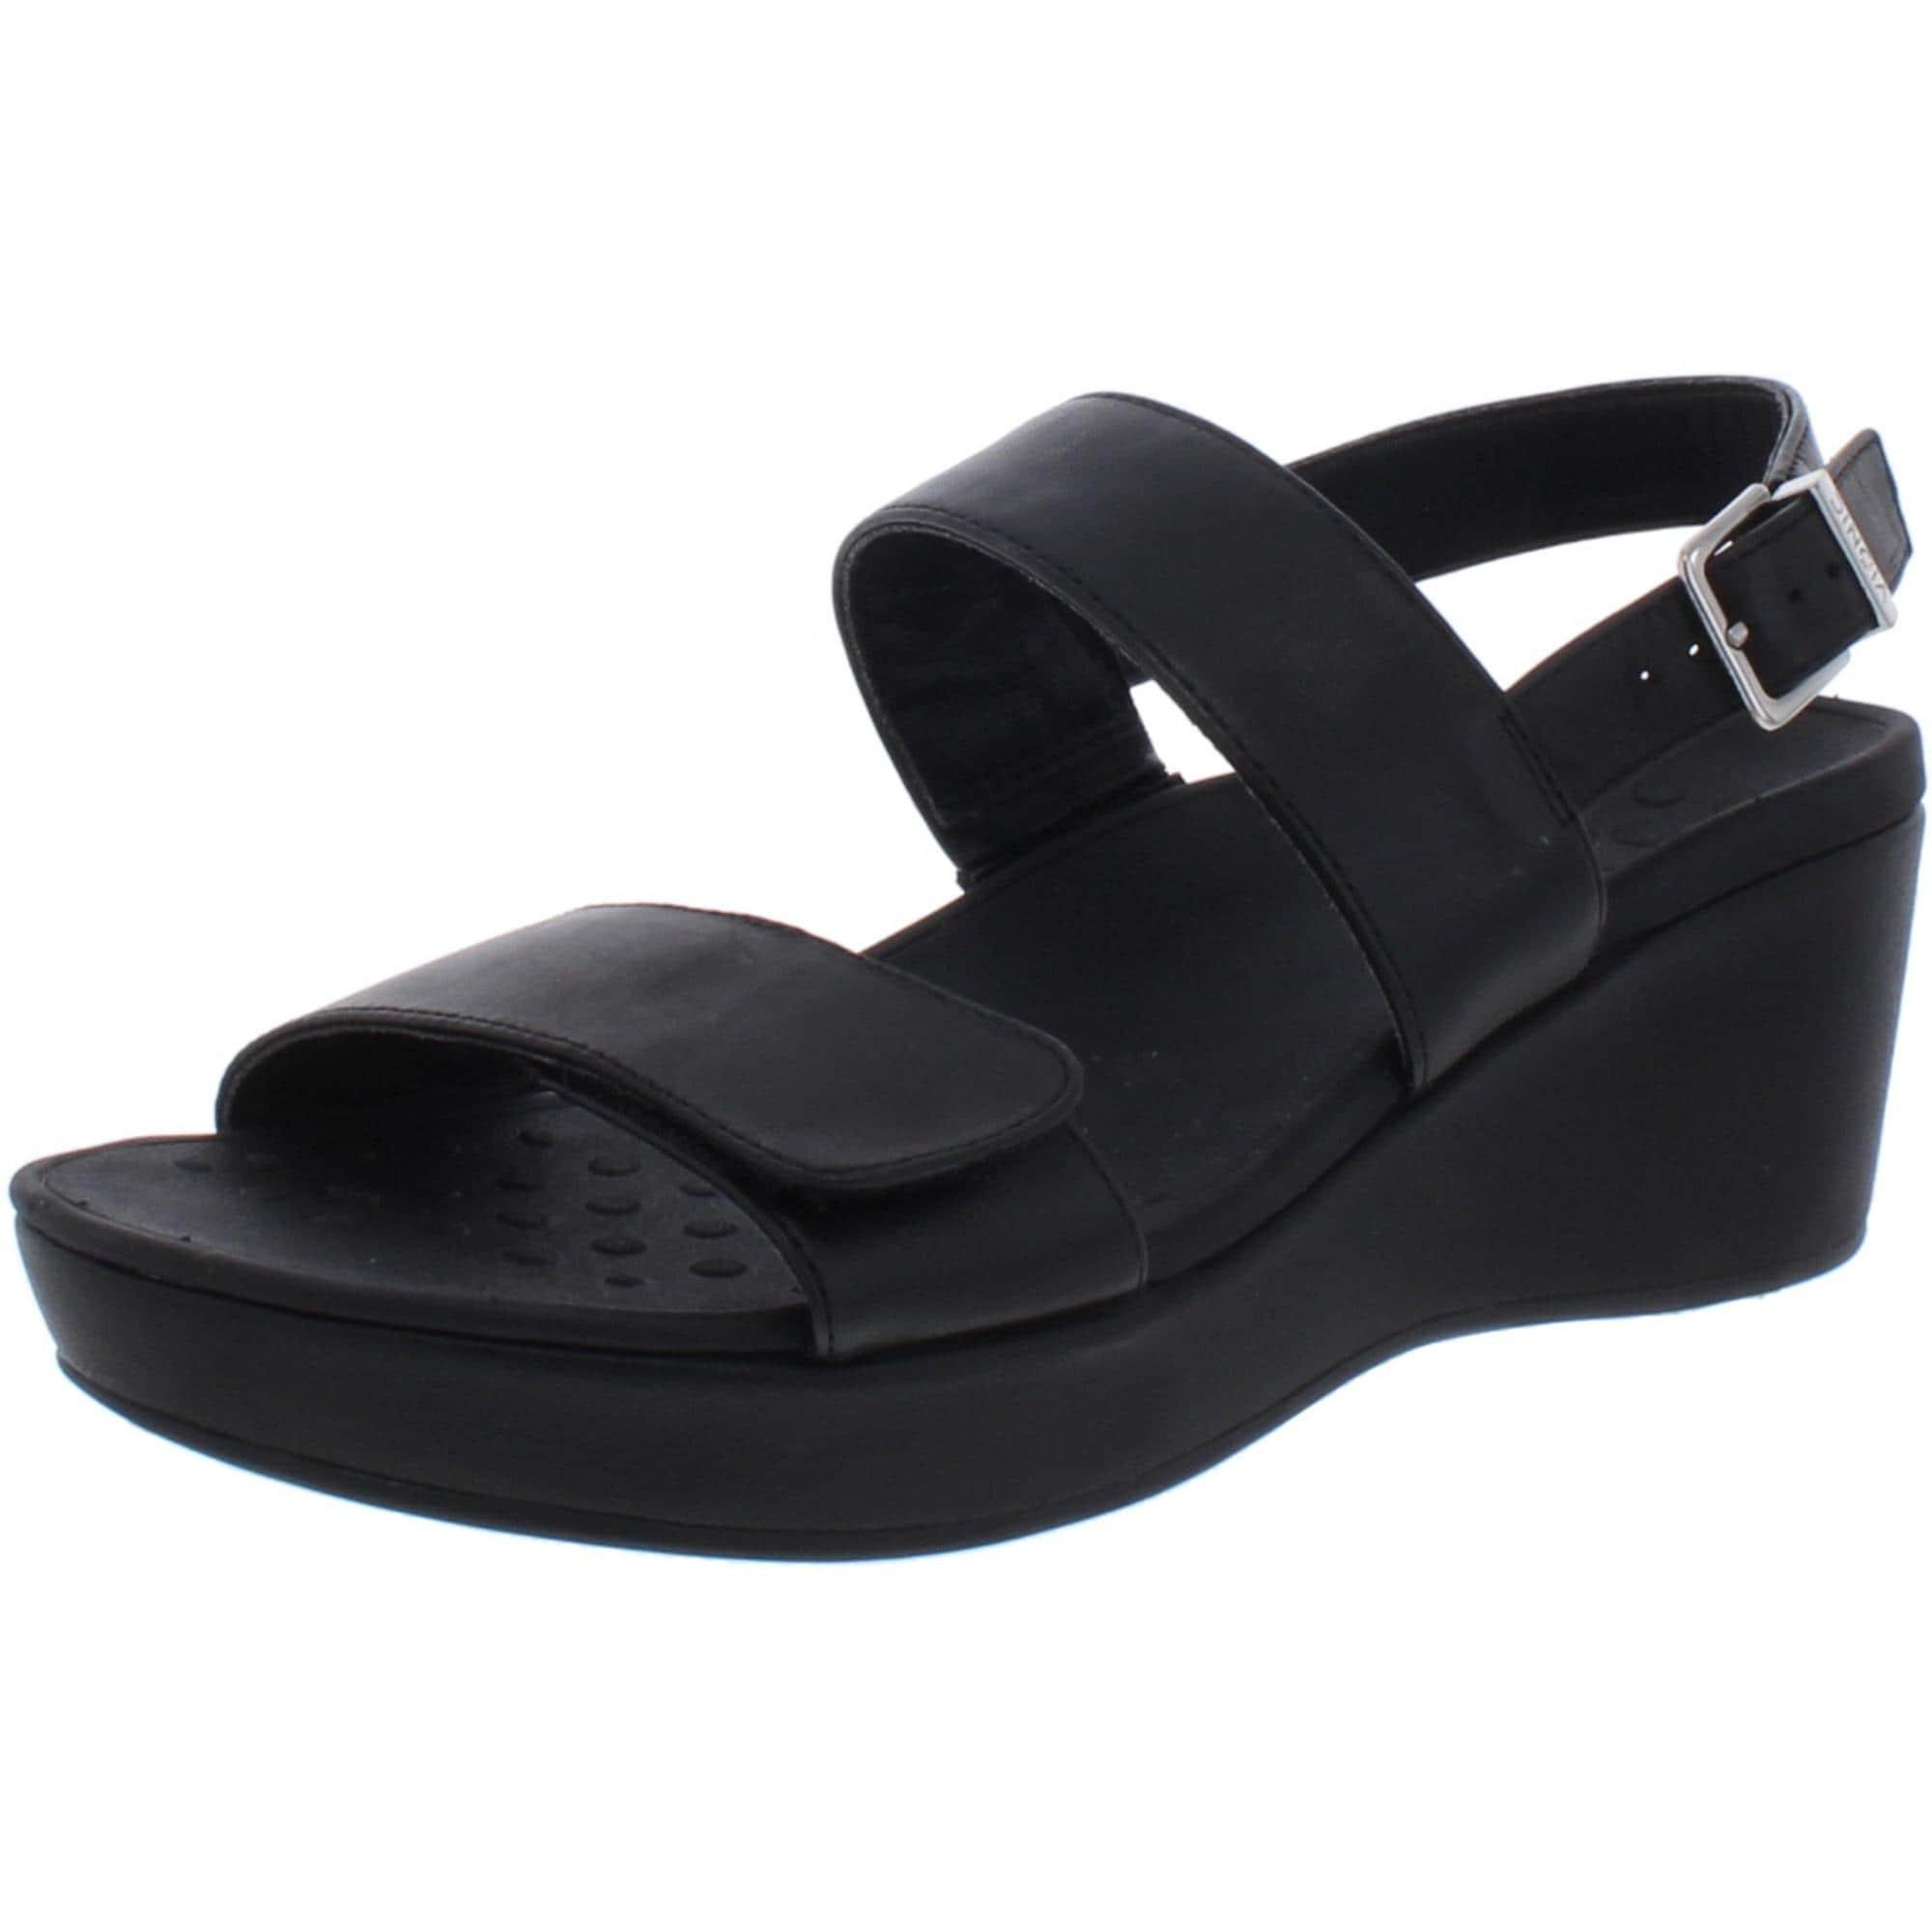 Shop Vionic Womens Lovell Wedge Sandals